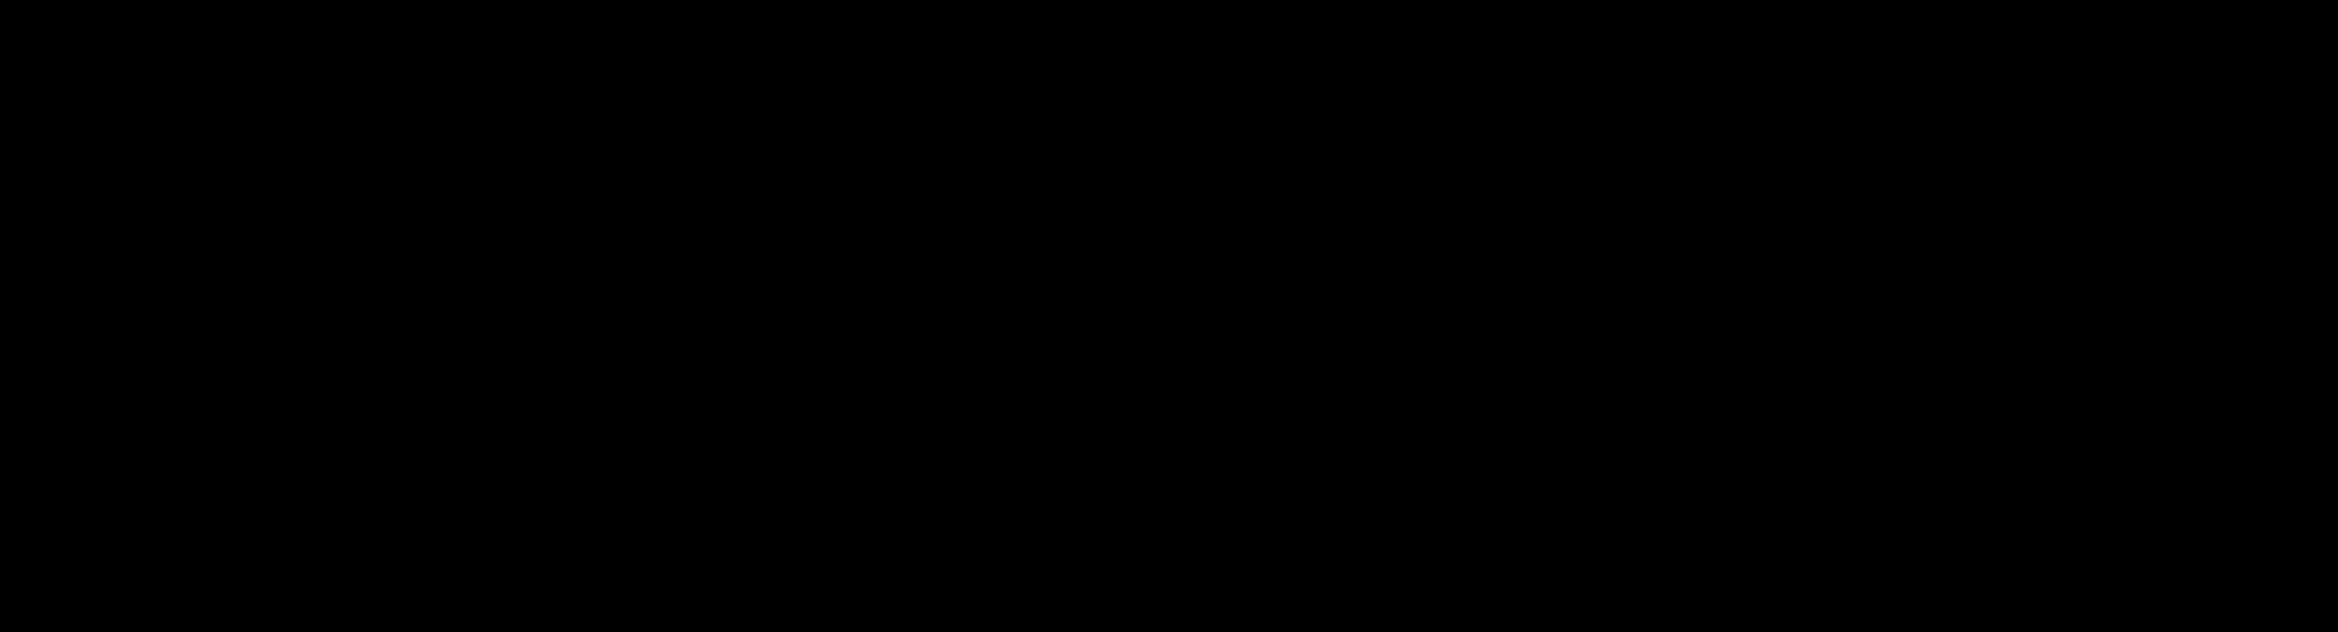 2338x632 Clipart